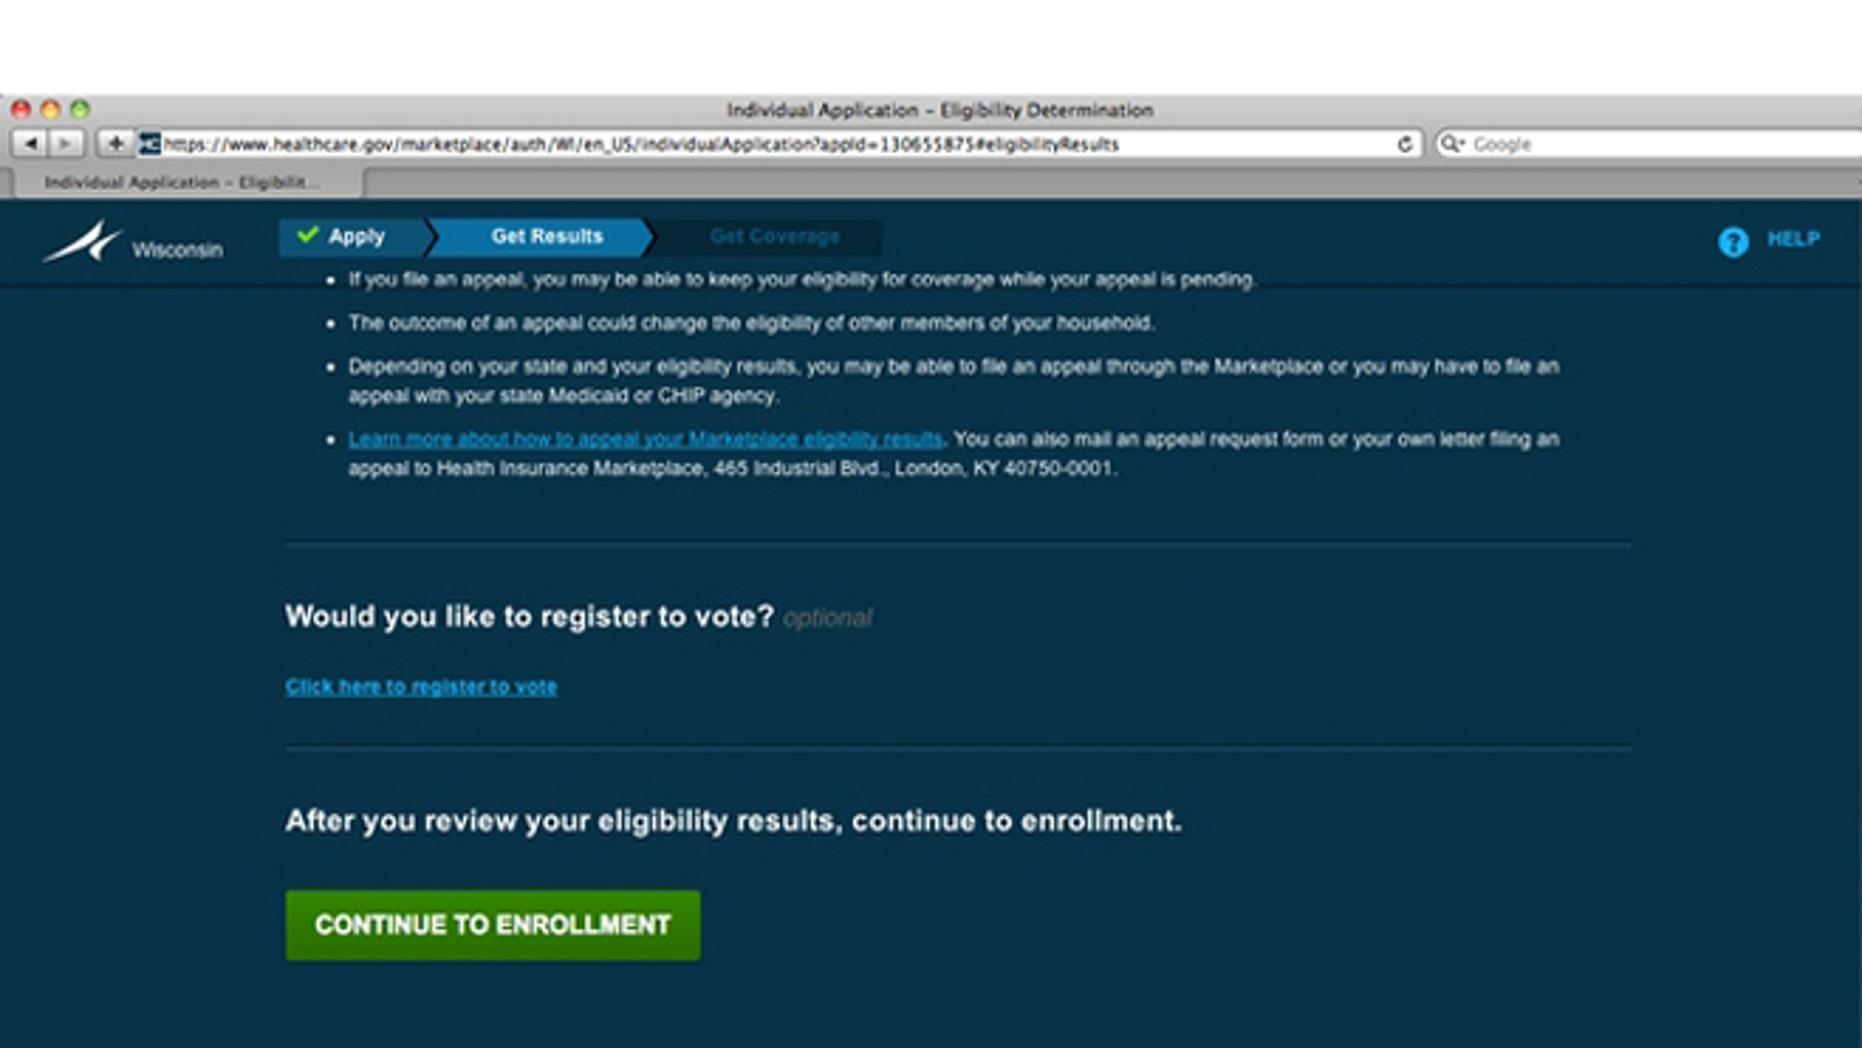 FILE: UNDATE: A frame-grab on the heathcare.gov website.